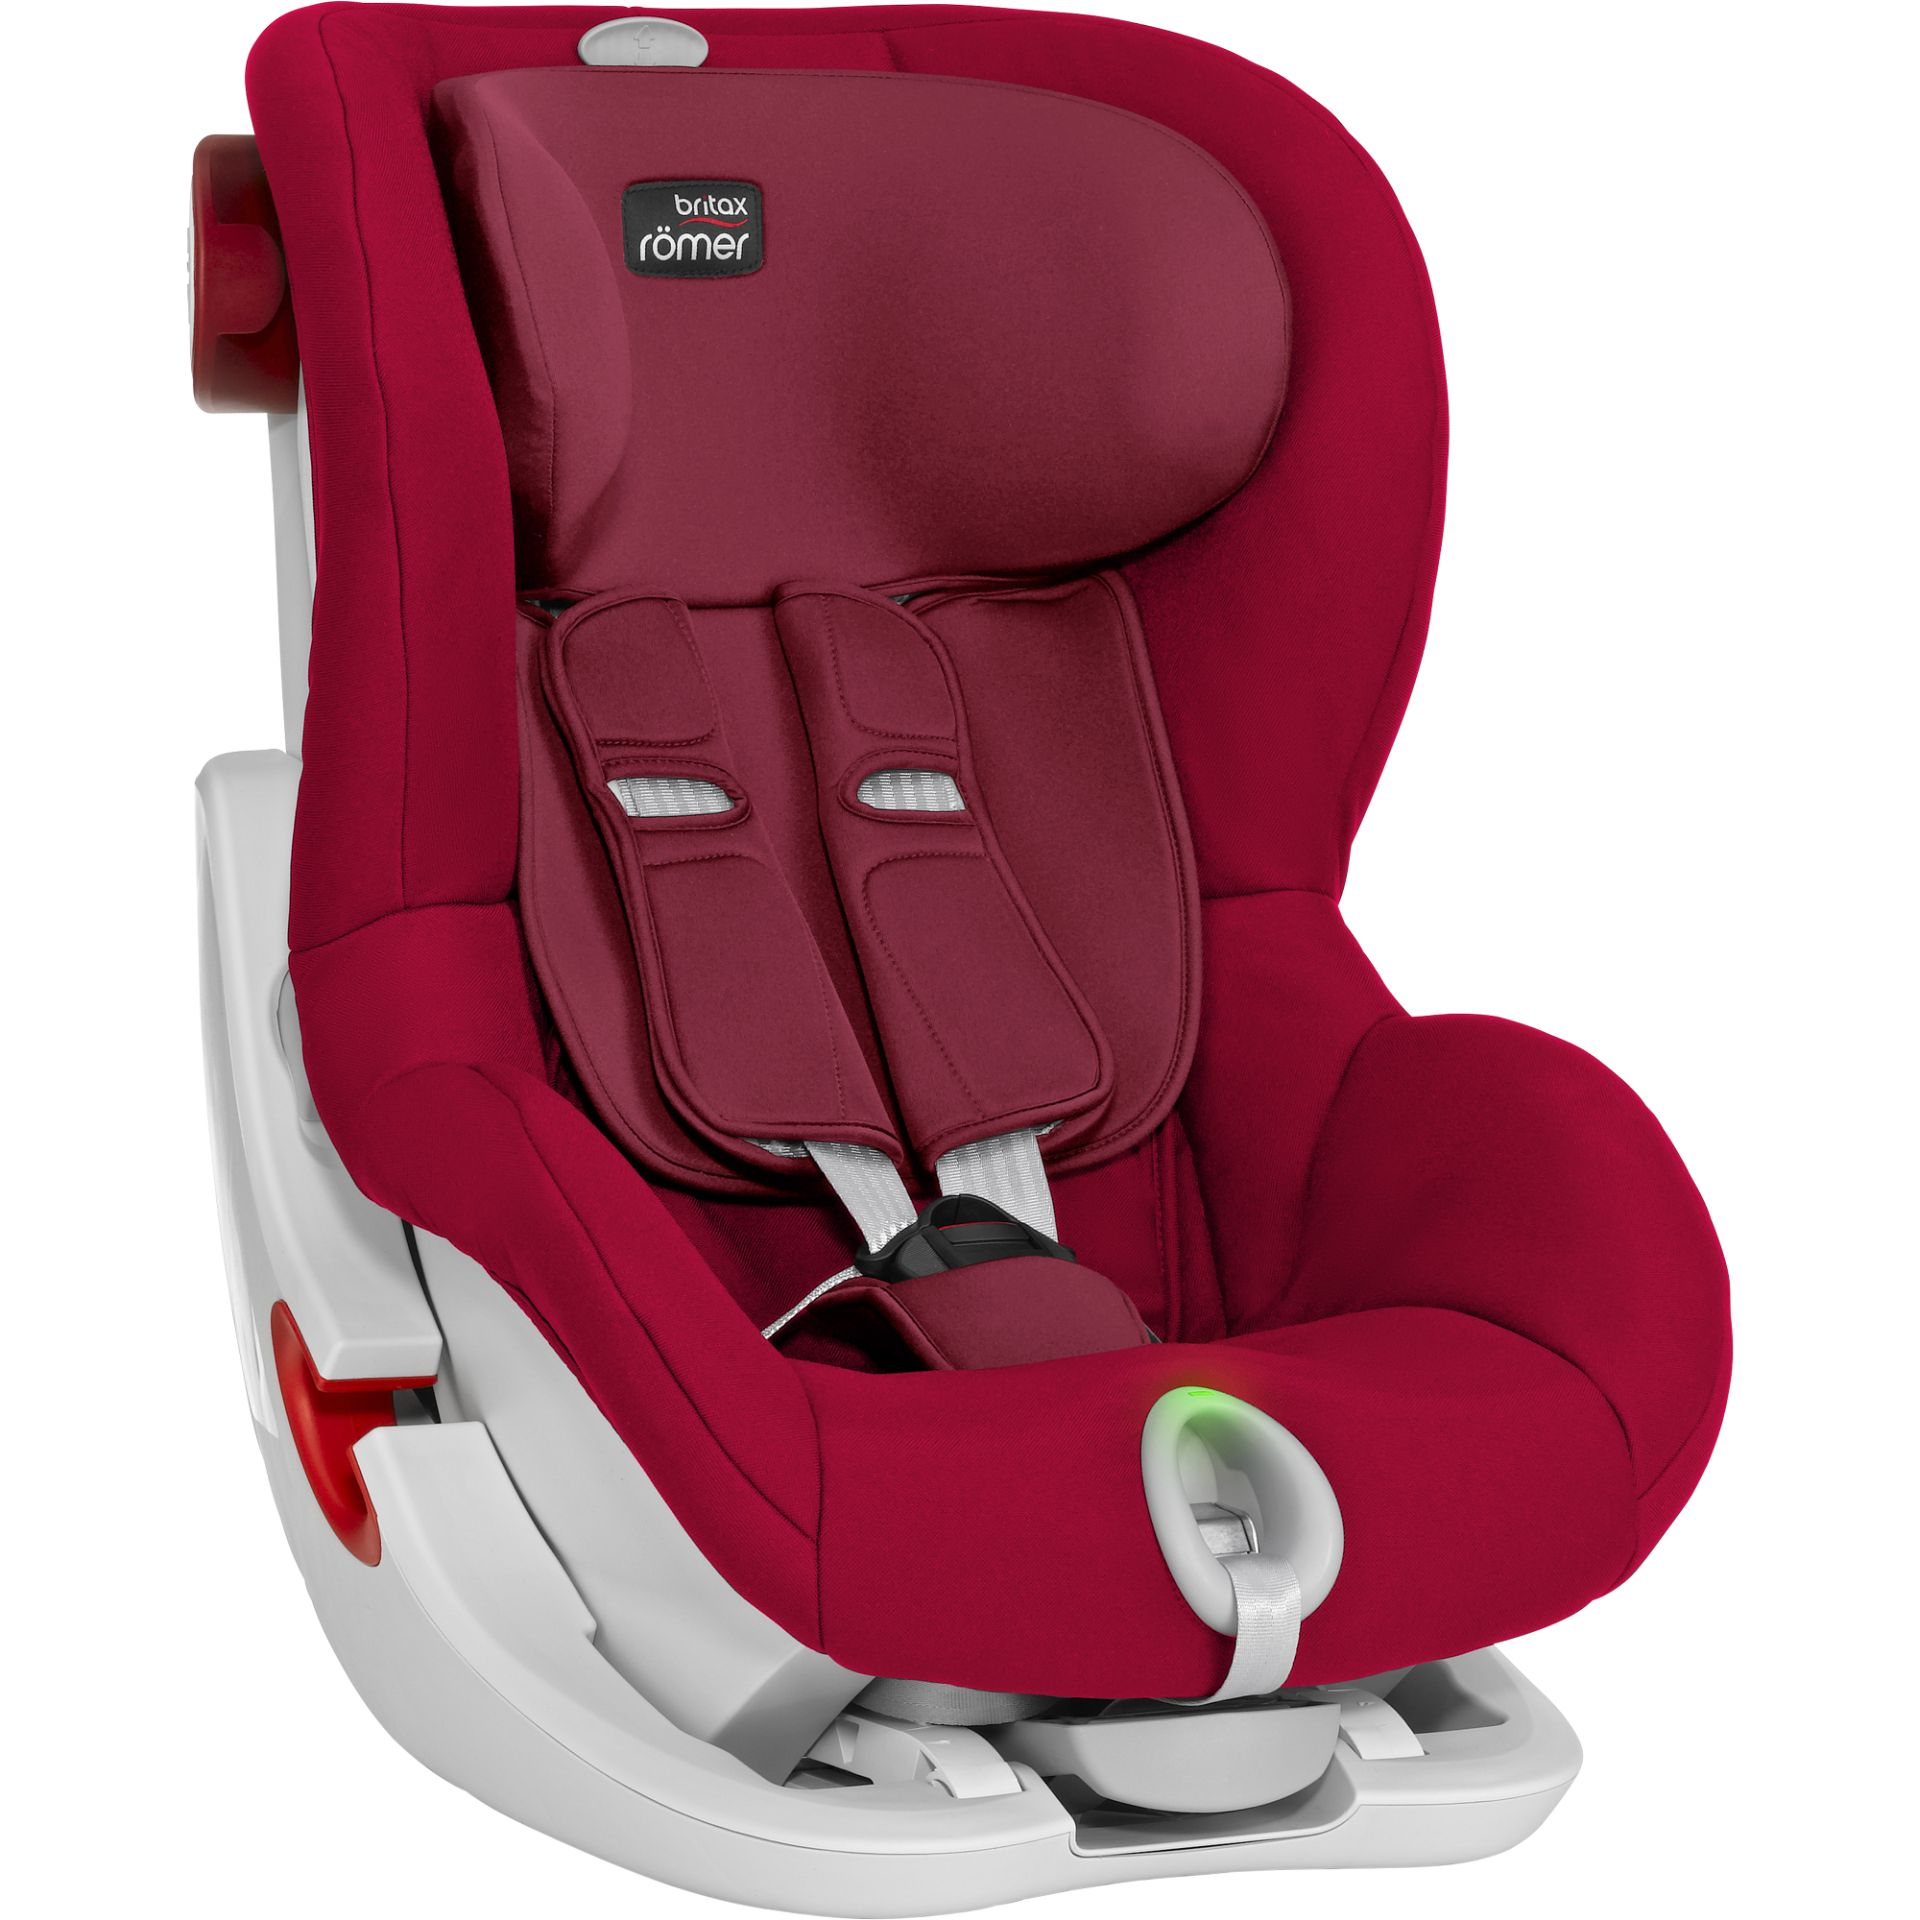 britax r mer child car seat king ii ls 2018 flame red buy at kidsroom car seats